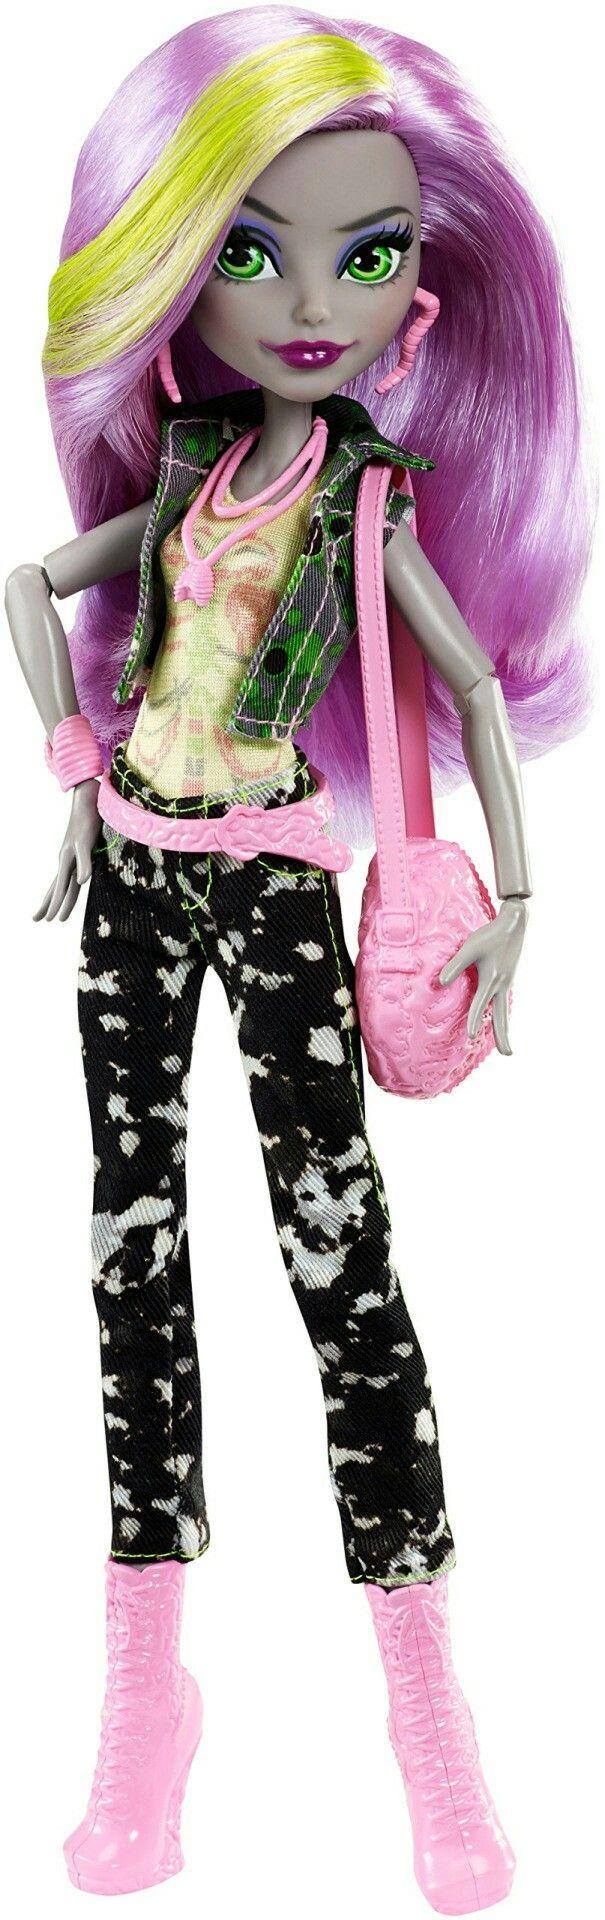 Moanica D'Kay -- Monster High doll.